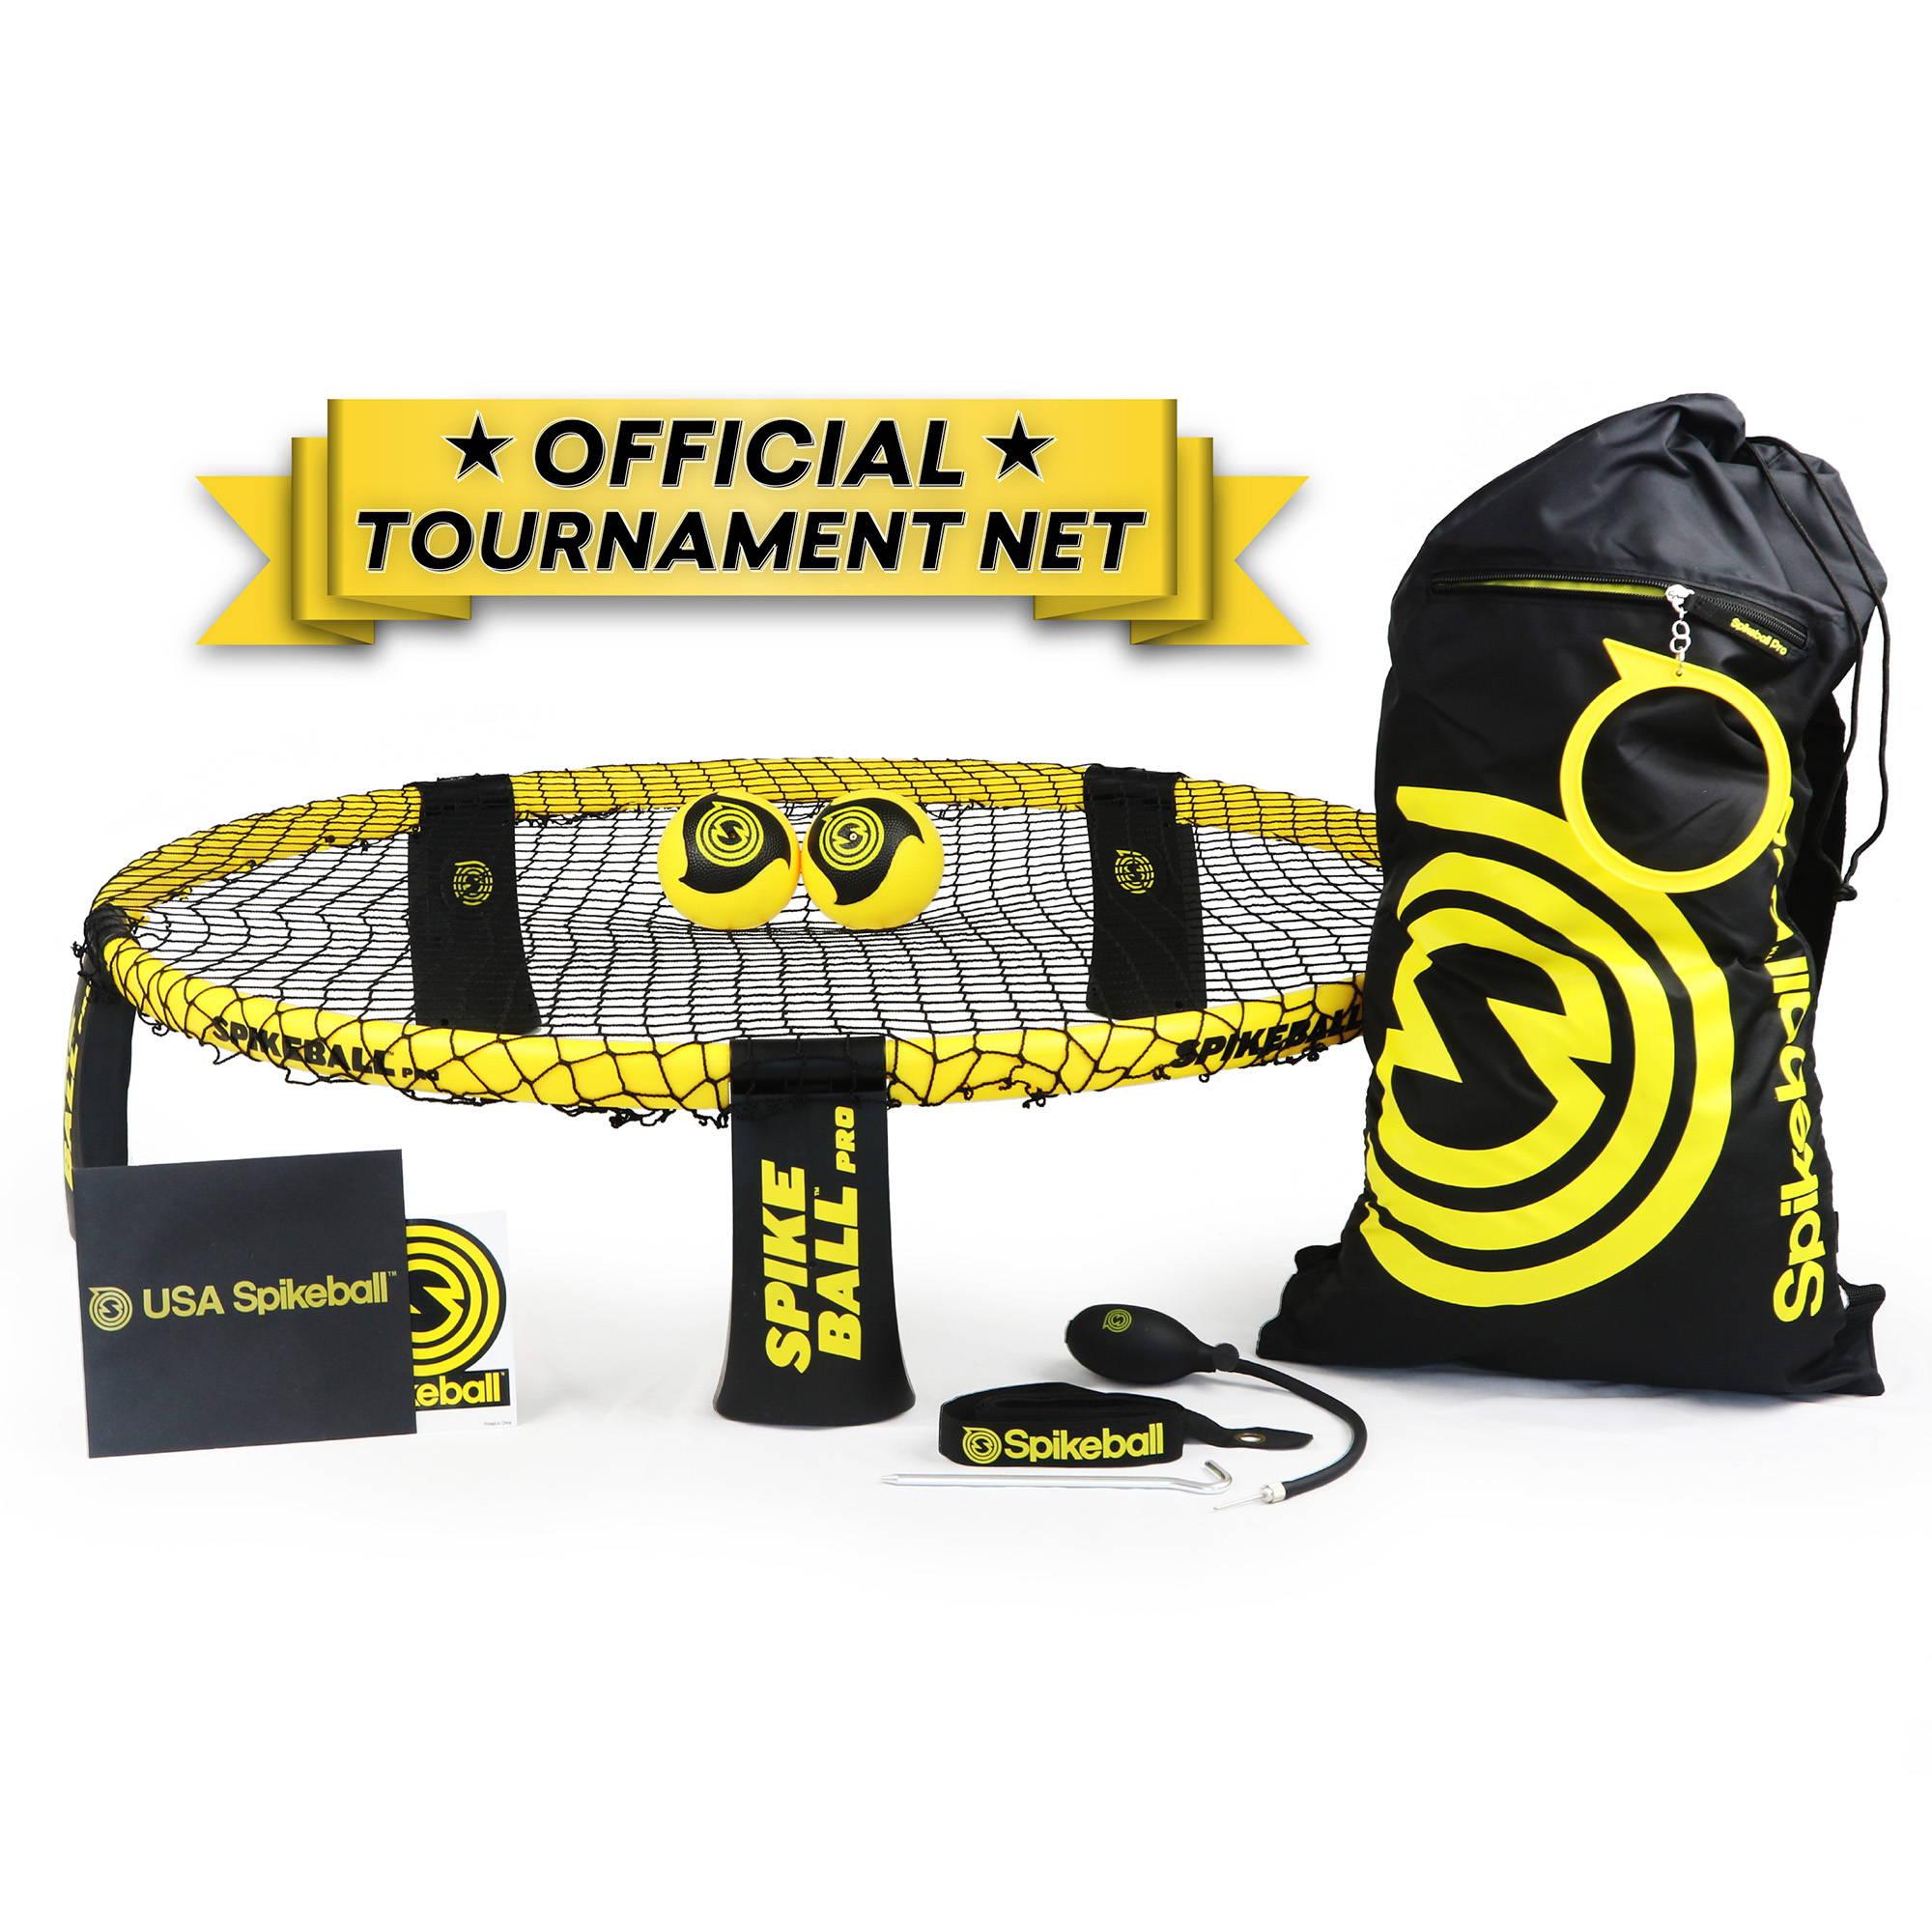 92c212c6b5f Spikeball Pro Kit | Spikeball Store